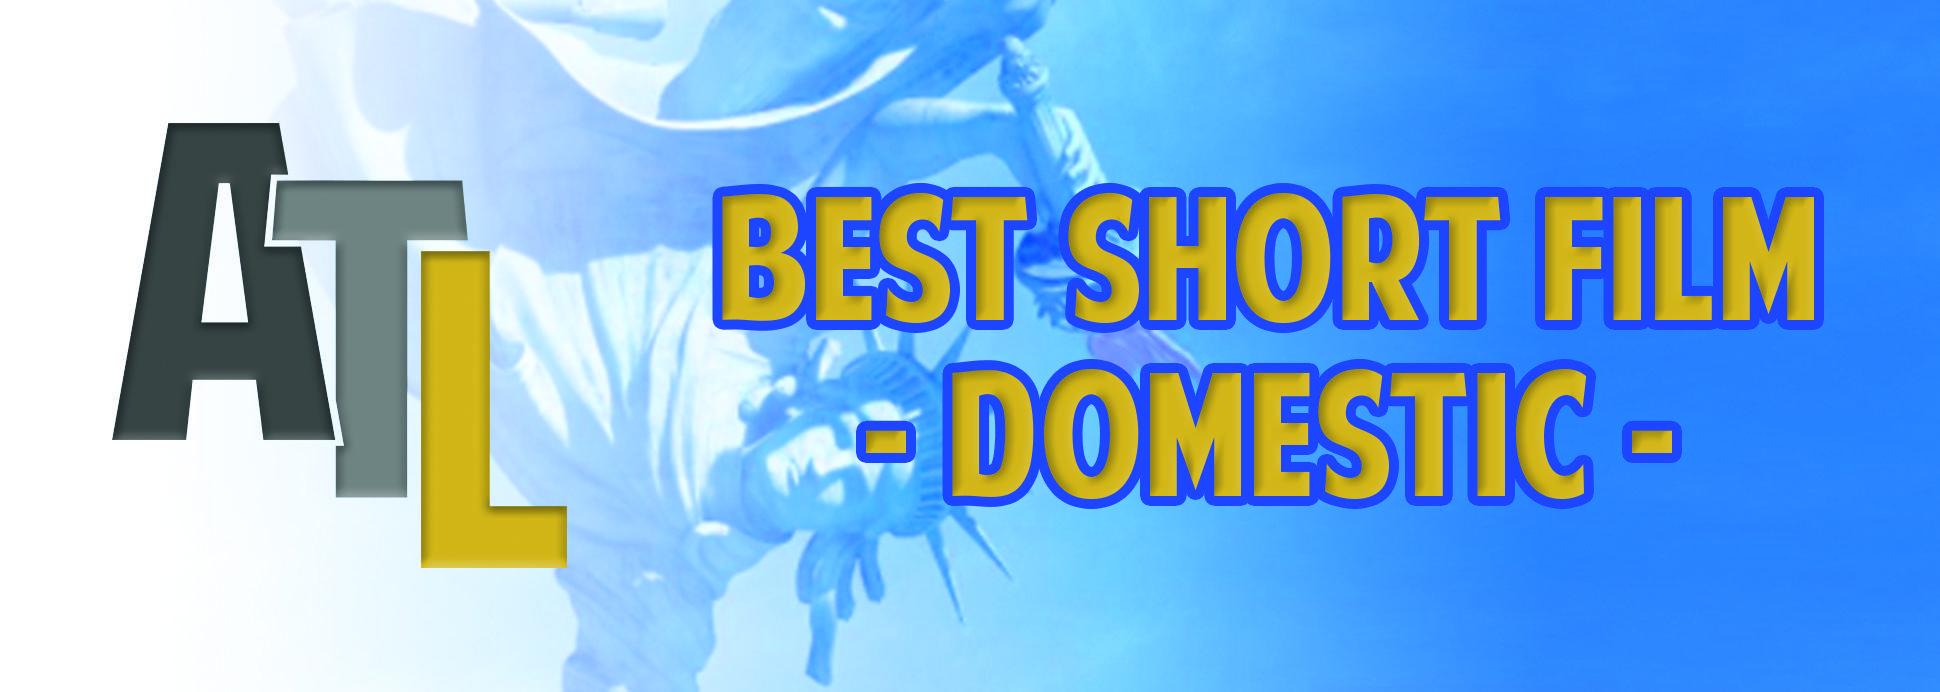 Best Short Film (Domestic)